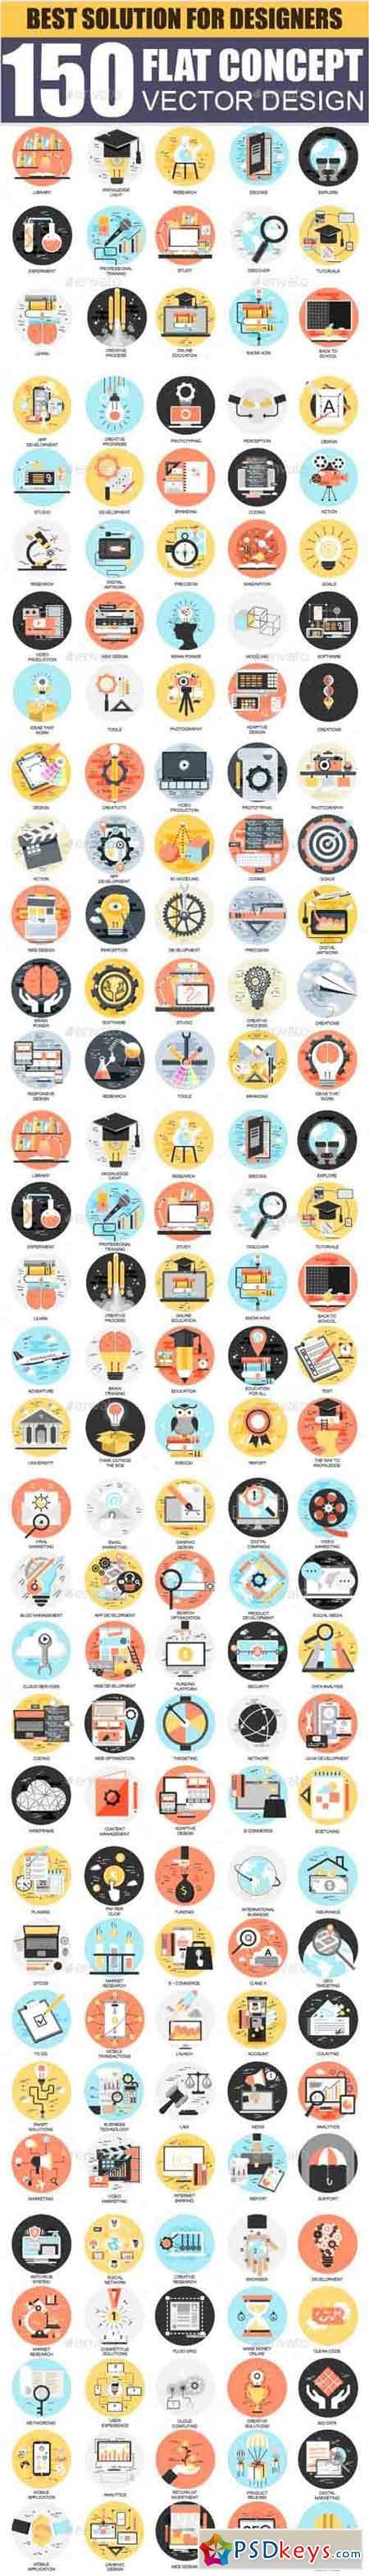 Set of Flat Design Concept Business Icons 18337040   PSDkeys